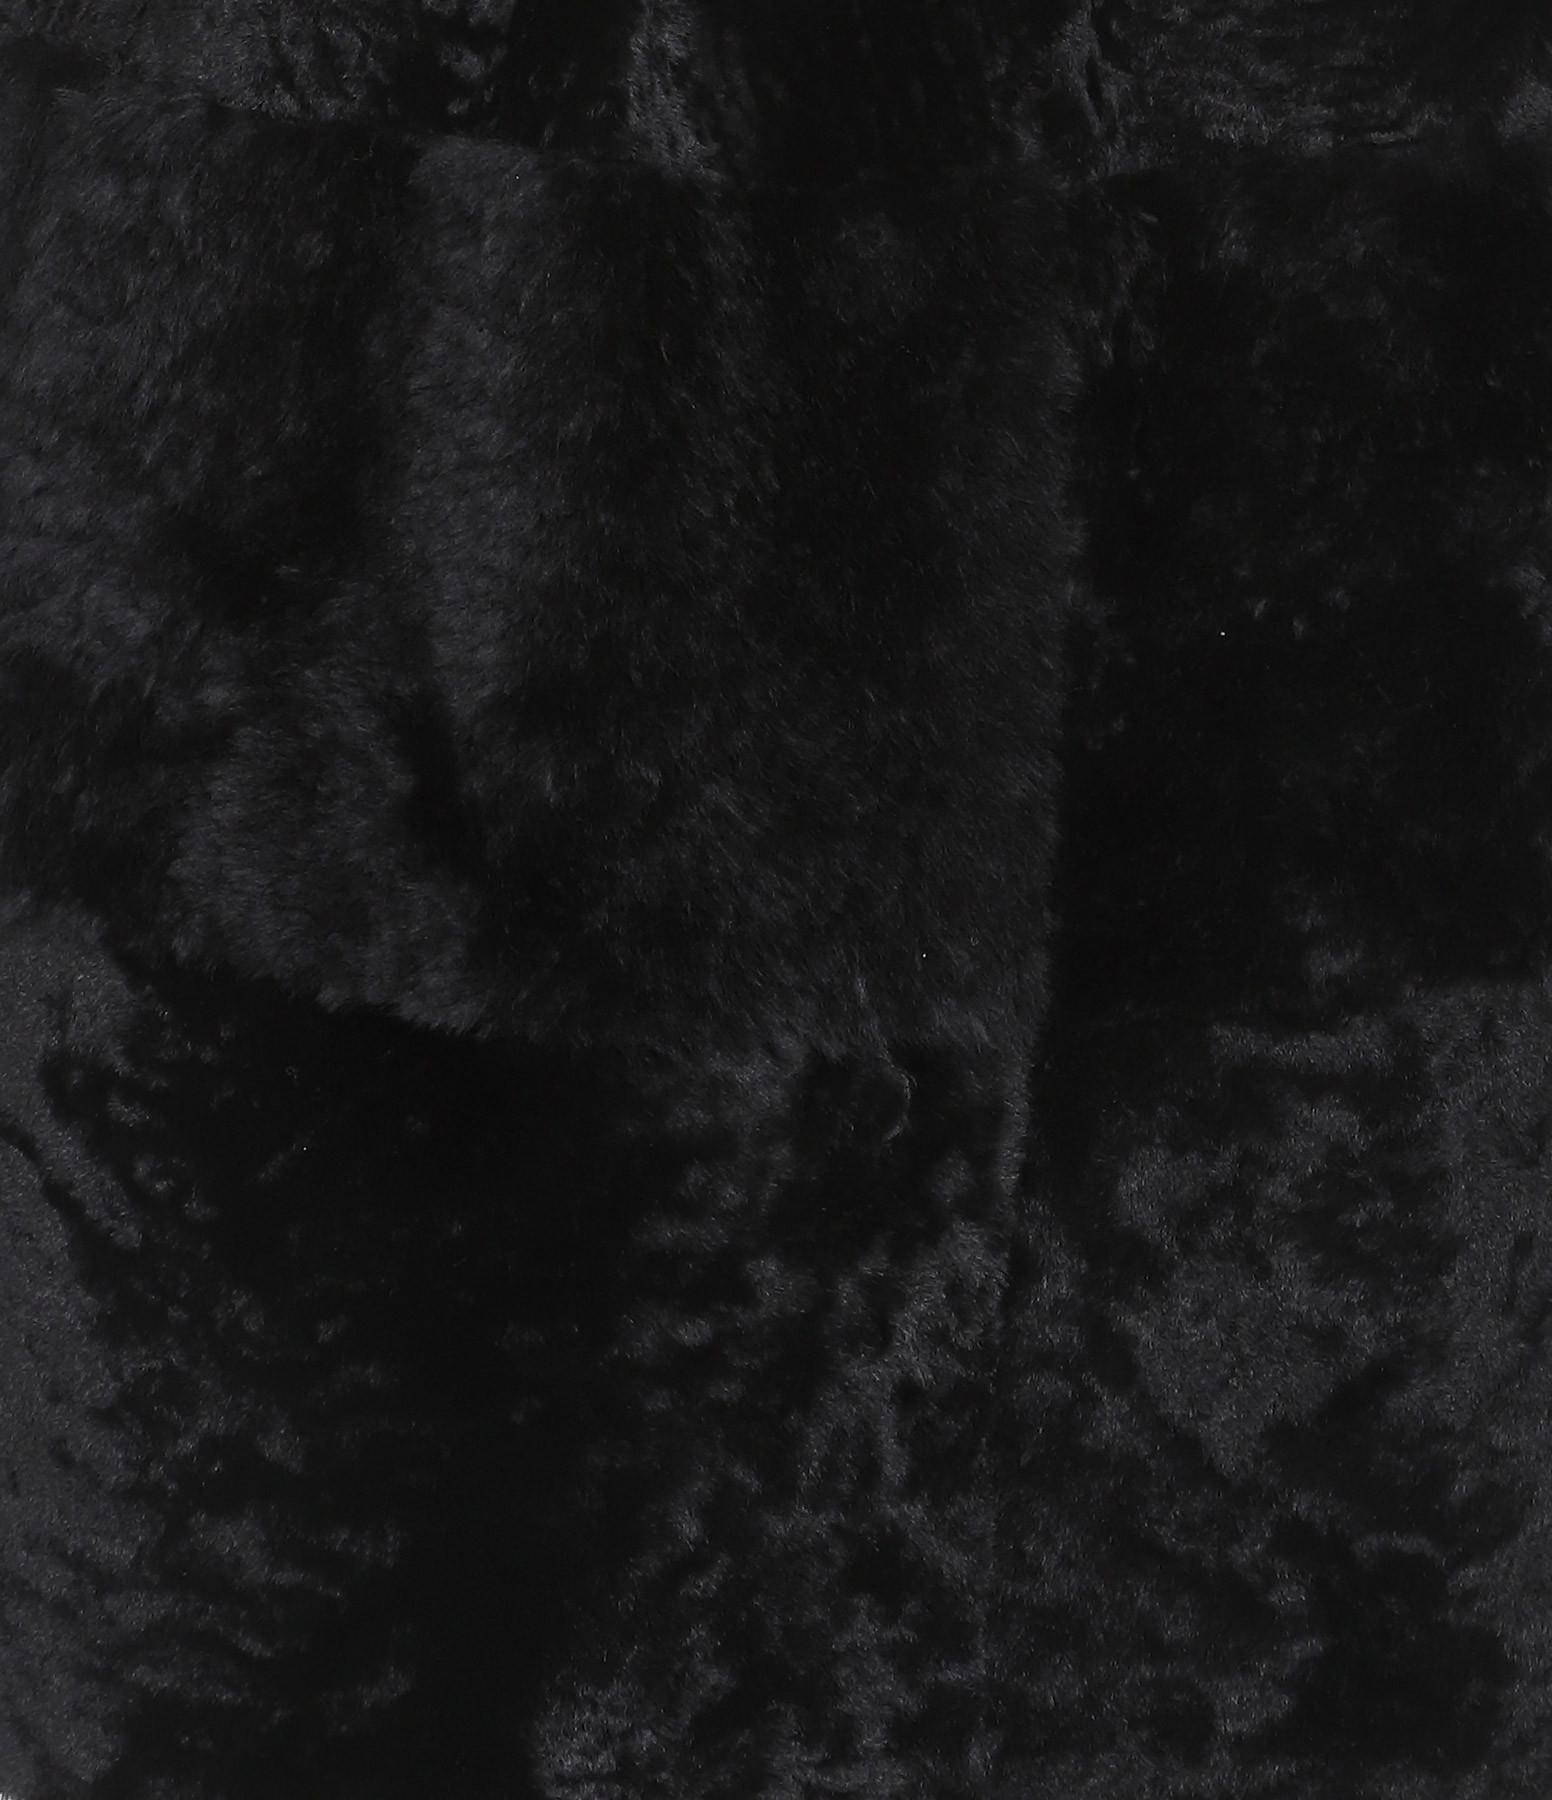 VENTCOUVERT - Manteau Patagonia Mouton Noir